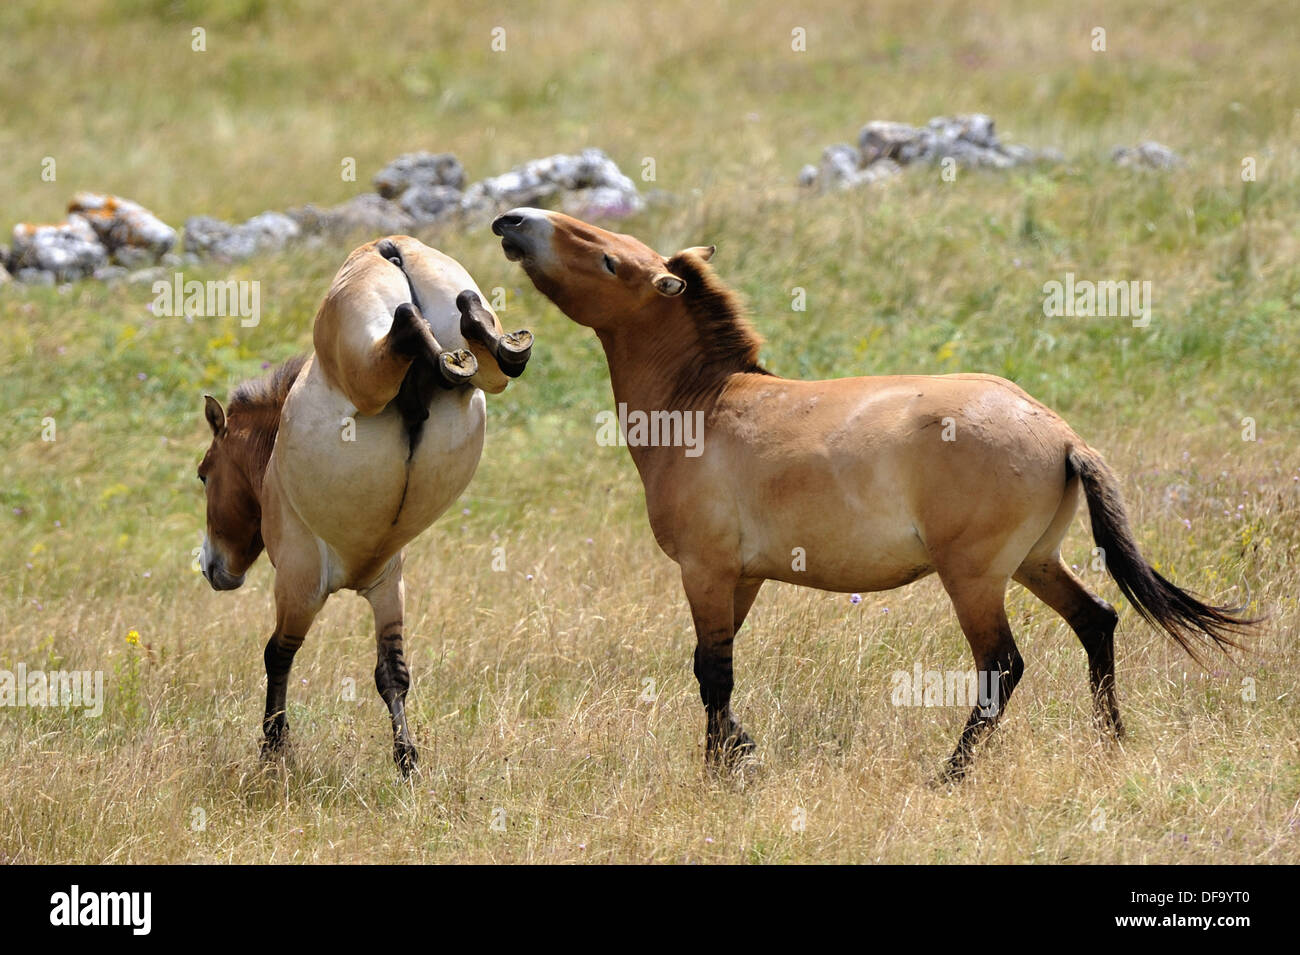 Semi wild Przewalski horses (Equus ferus przewalskii), two stallions fighting, Parc du Villaret, Causse Mejean, Stock Photo